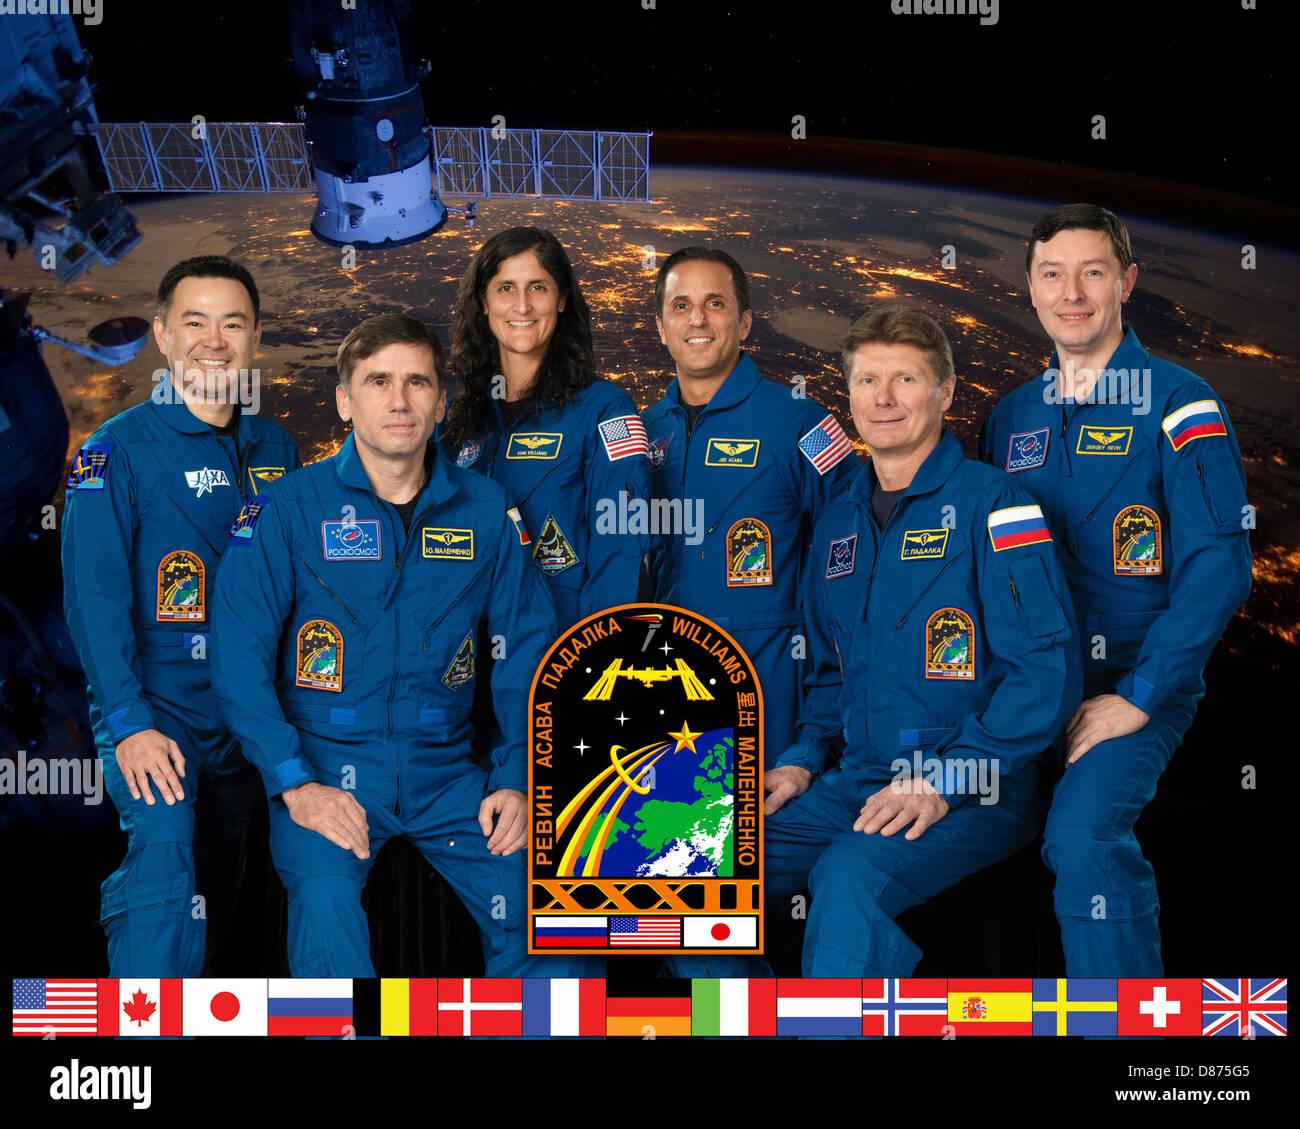 Expedition 32 crew portrait.jpg - Stock Image